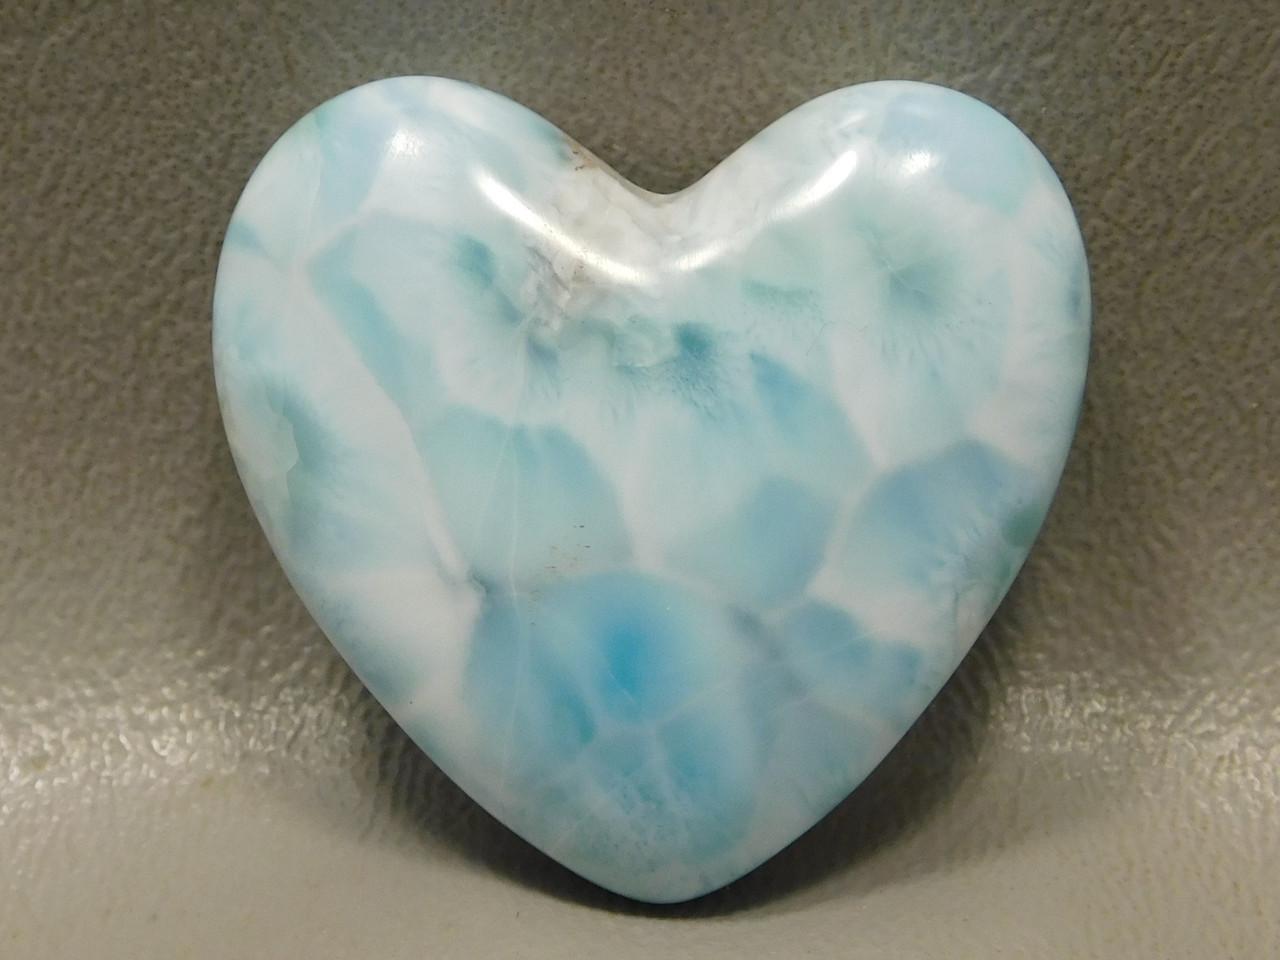 Cabochon Heart Shaped Sea Blue Stone Larimar Jewelry Design #24